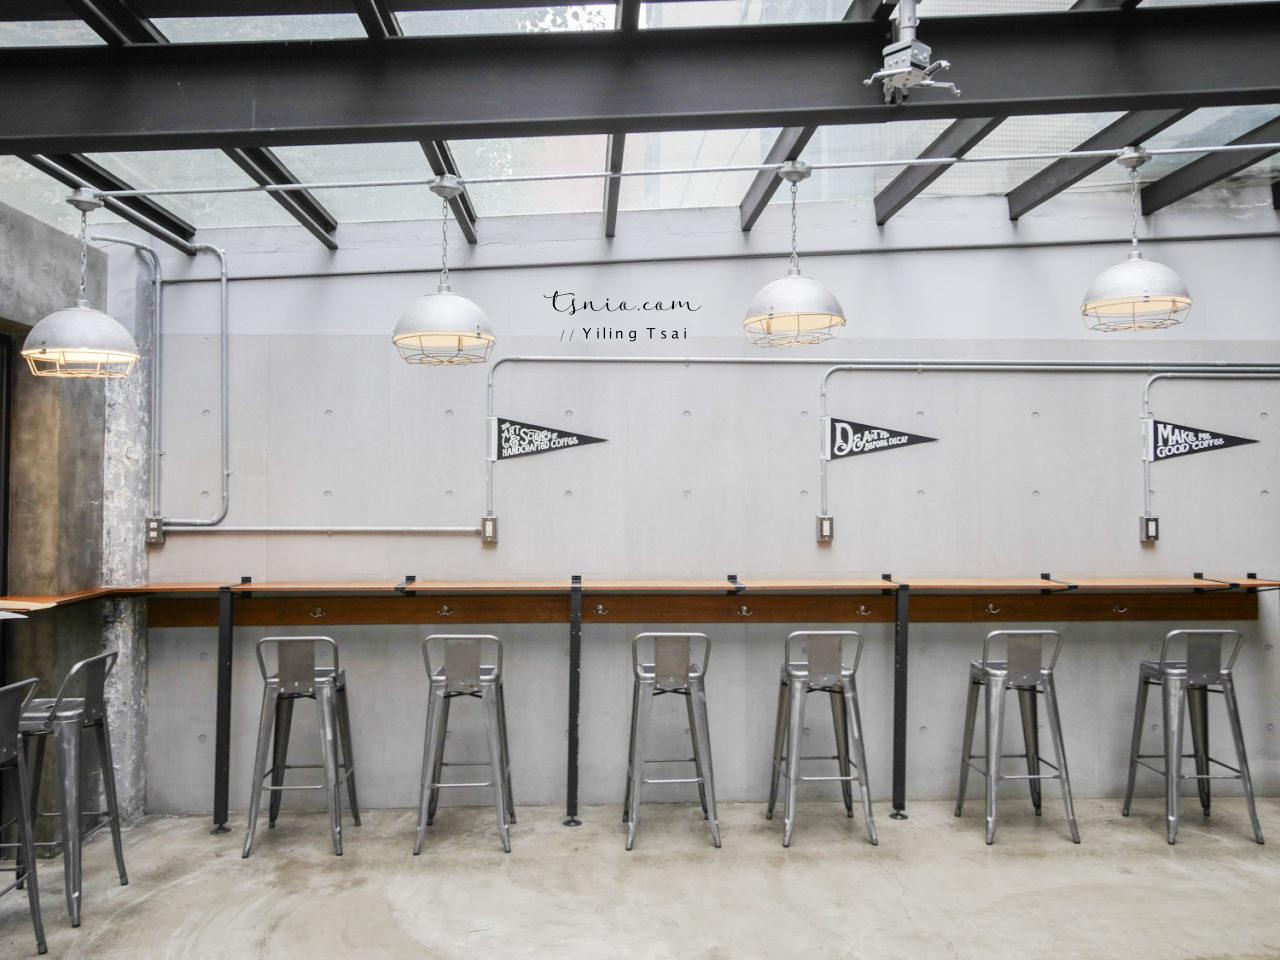 民生社區咖啡廳 All Day Roasting Company 工業風不限時咖啡廳